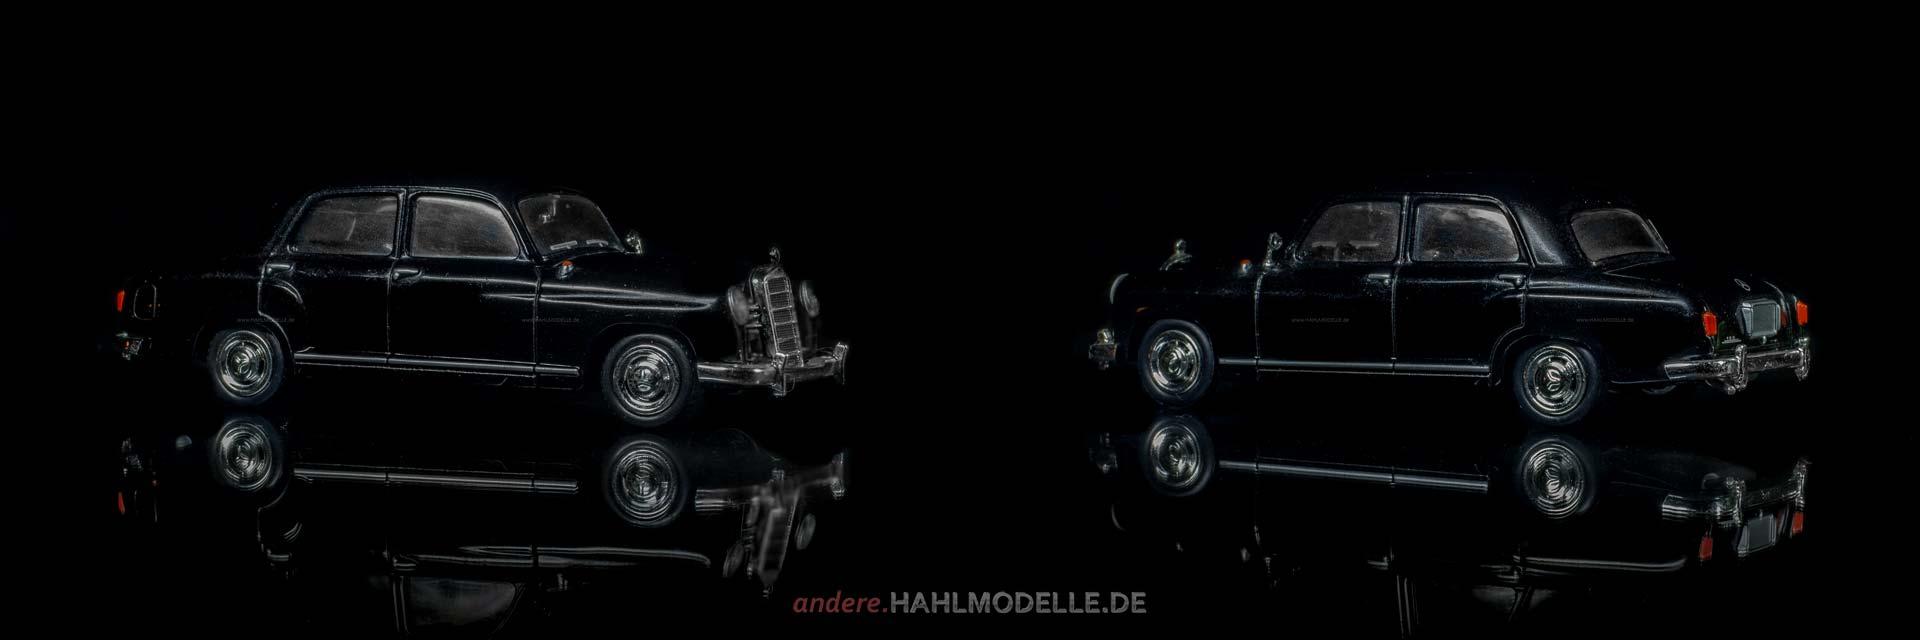 Mercedes-Benz 180 (W 120) | Limousine | Ixo | www.andere.hahlmodelle.de